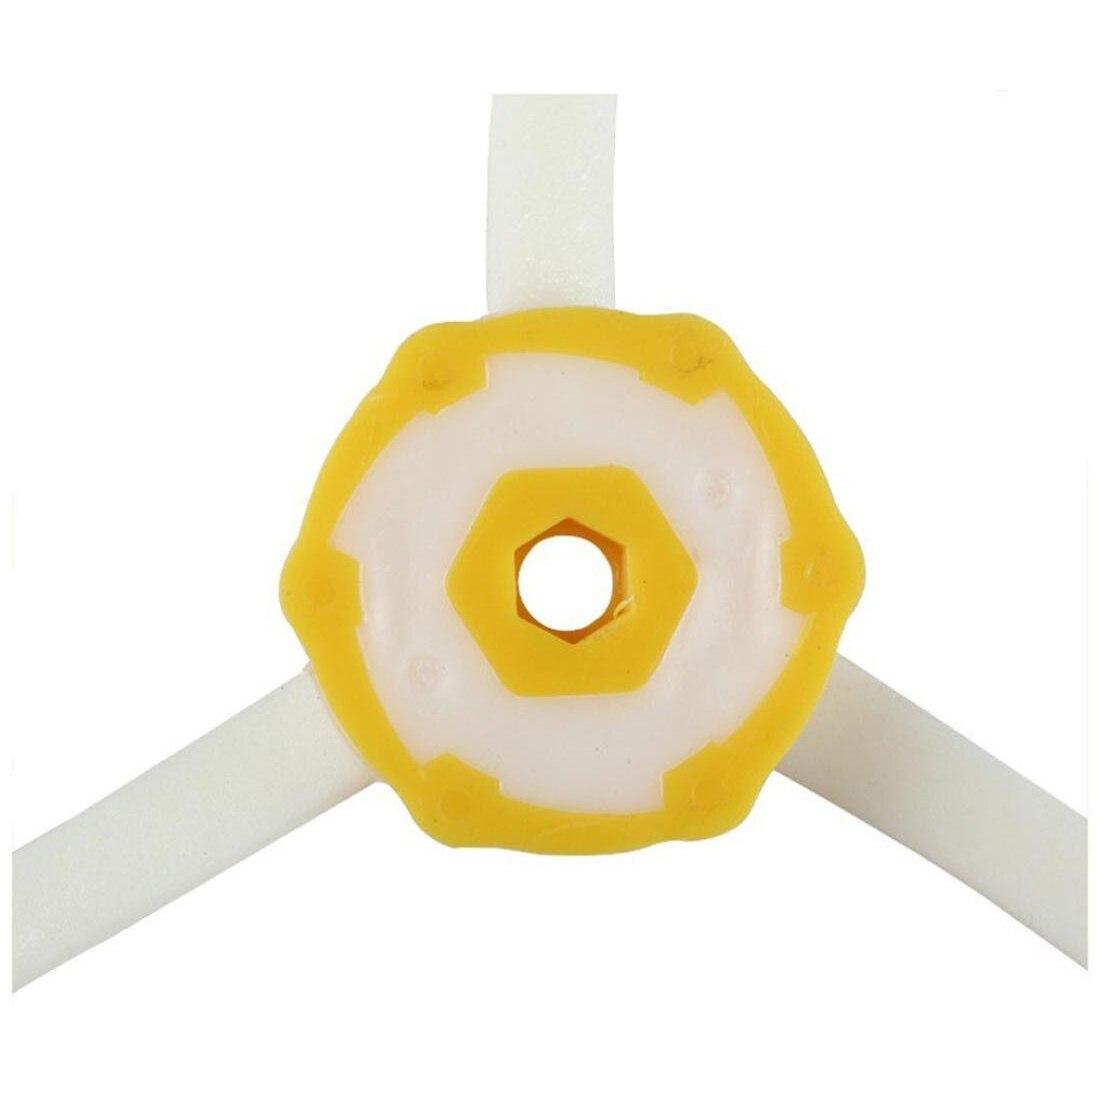 500 56708 564 Hingebungsvoll 3 Stücke Sekundäre Pinsel Staubsauger Ersatz Kit Für Roomba Irobot 500 Serie 52708